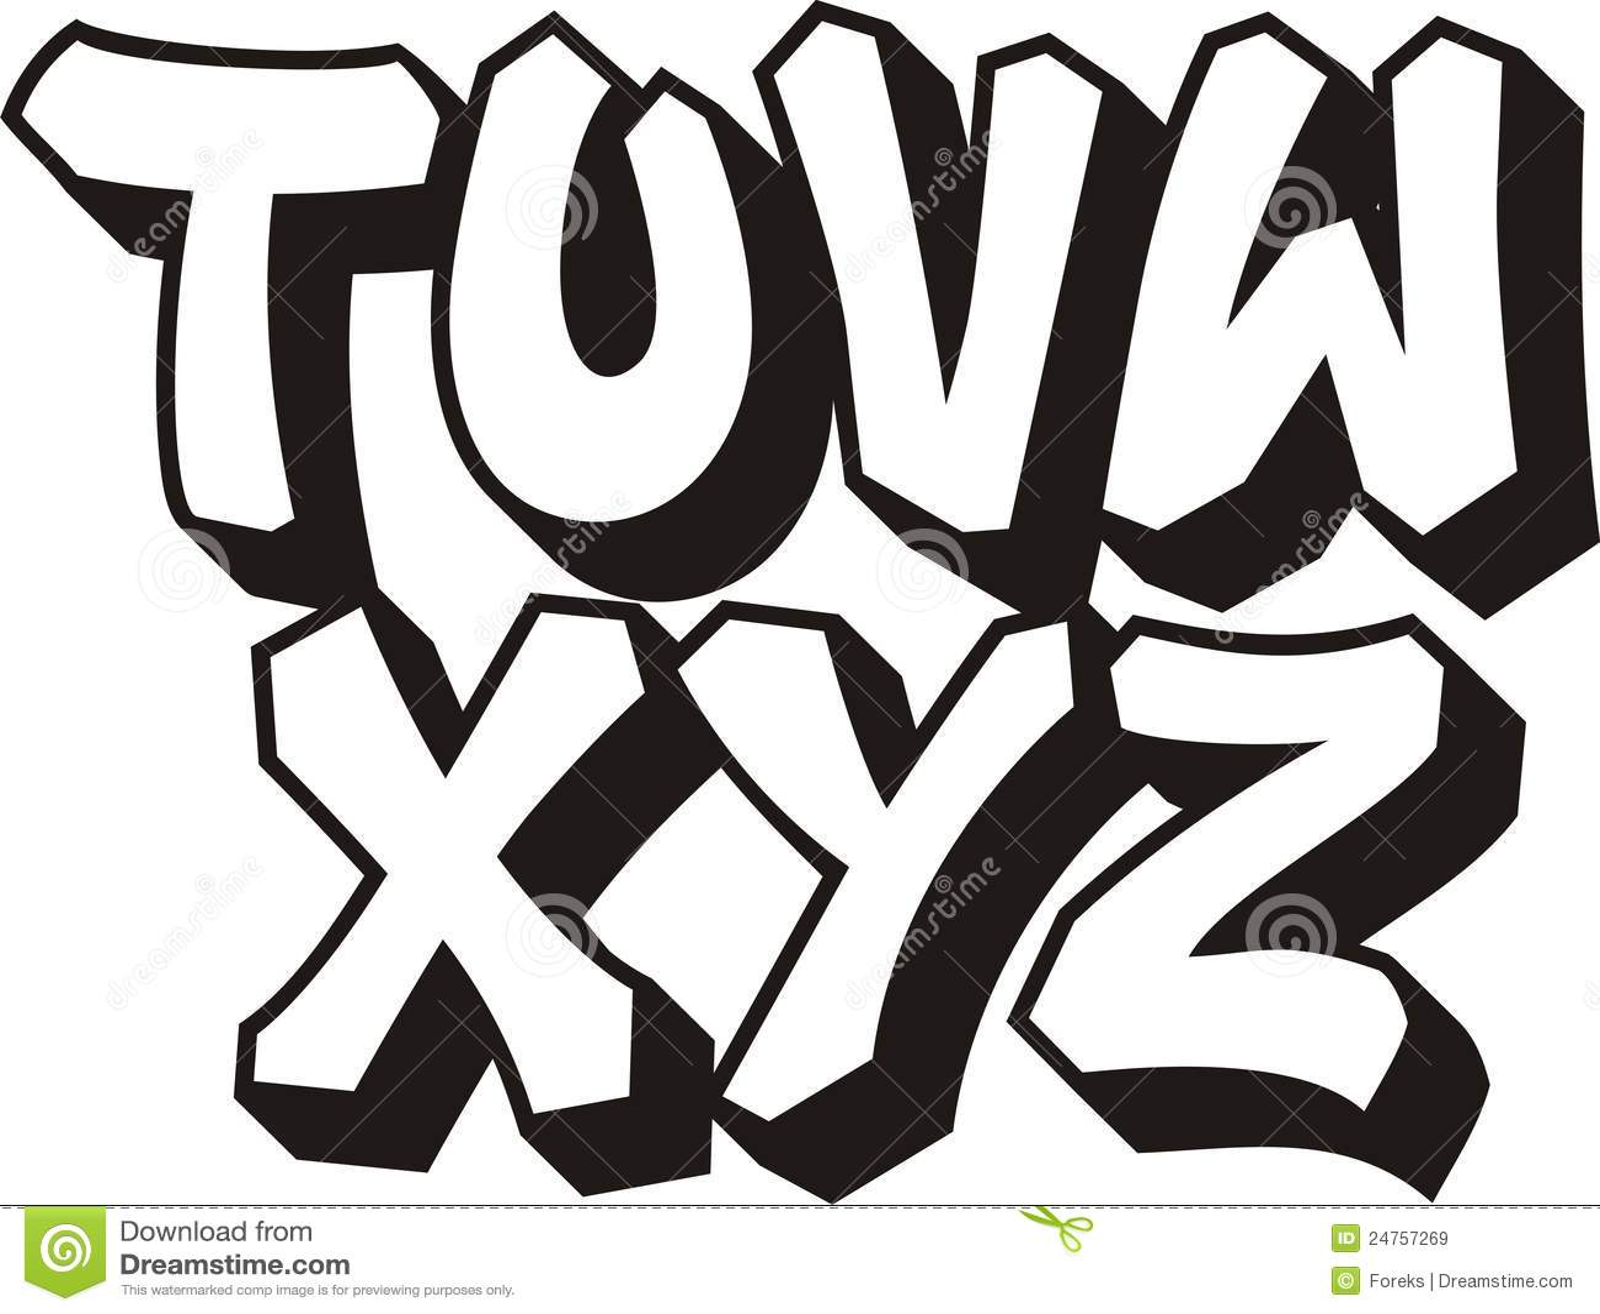 Graffiti Font Part 3 Royalty Free Stock Images